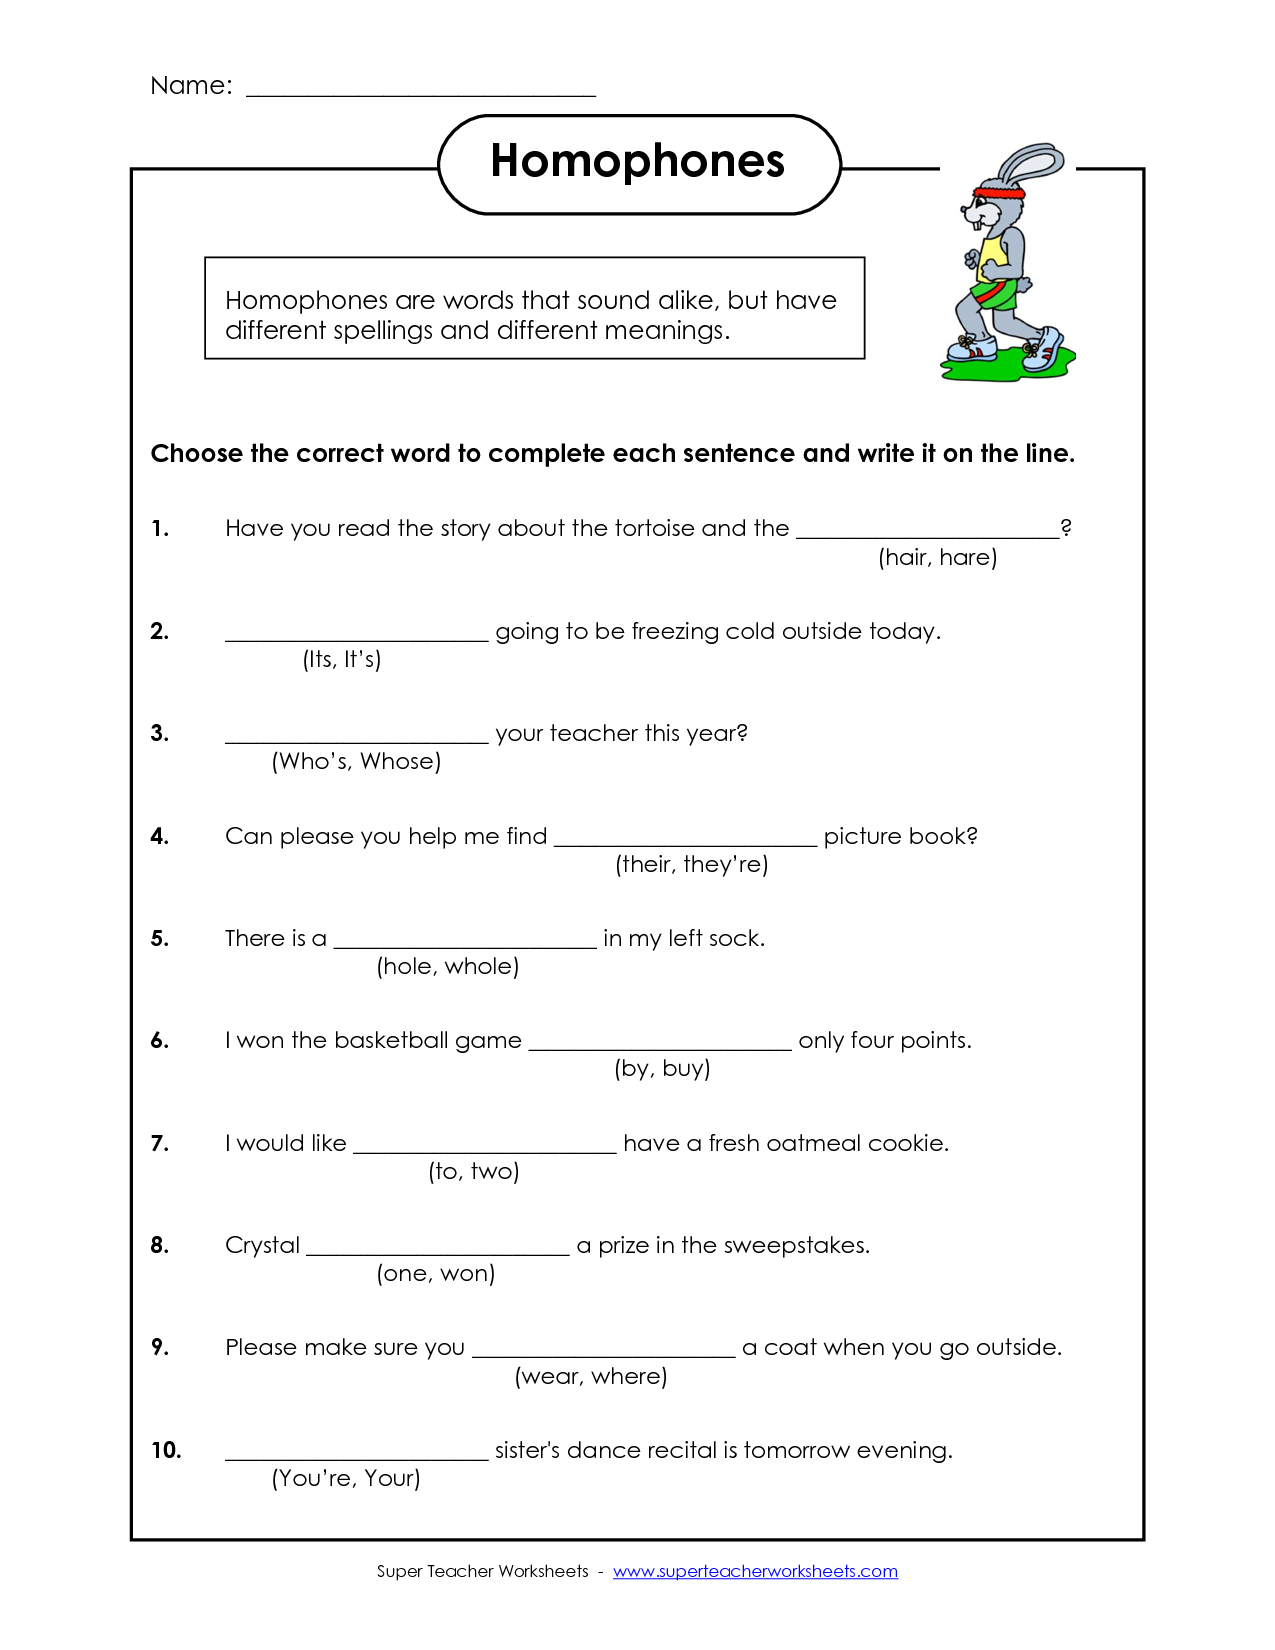 Homophones Eye Ball Worksheets For First Grade Homophones